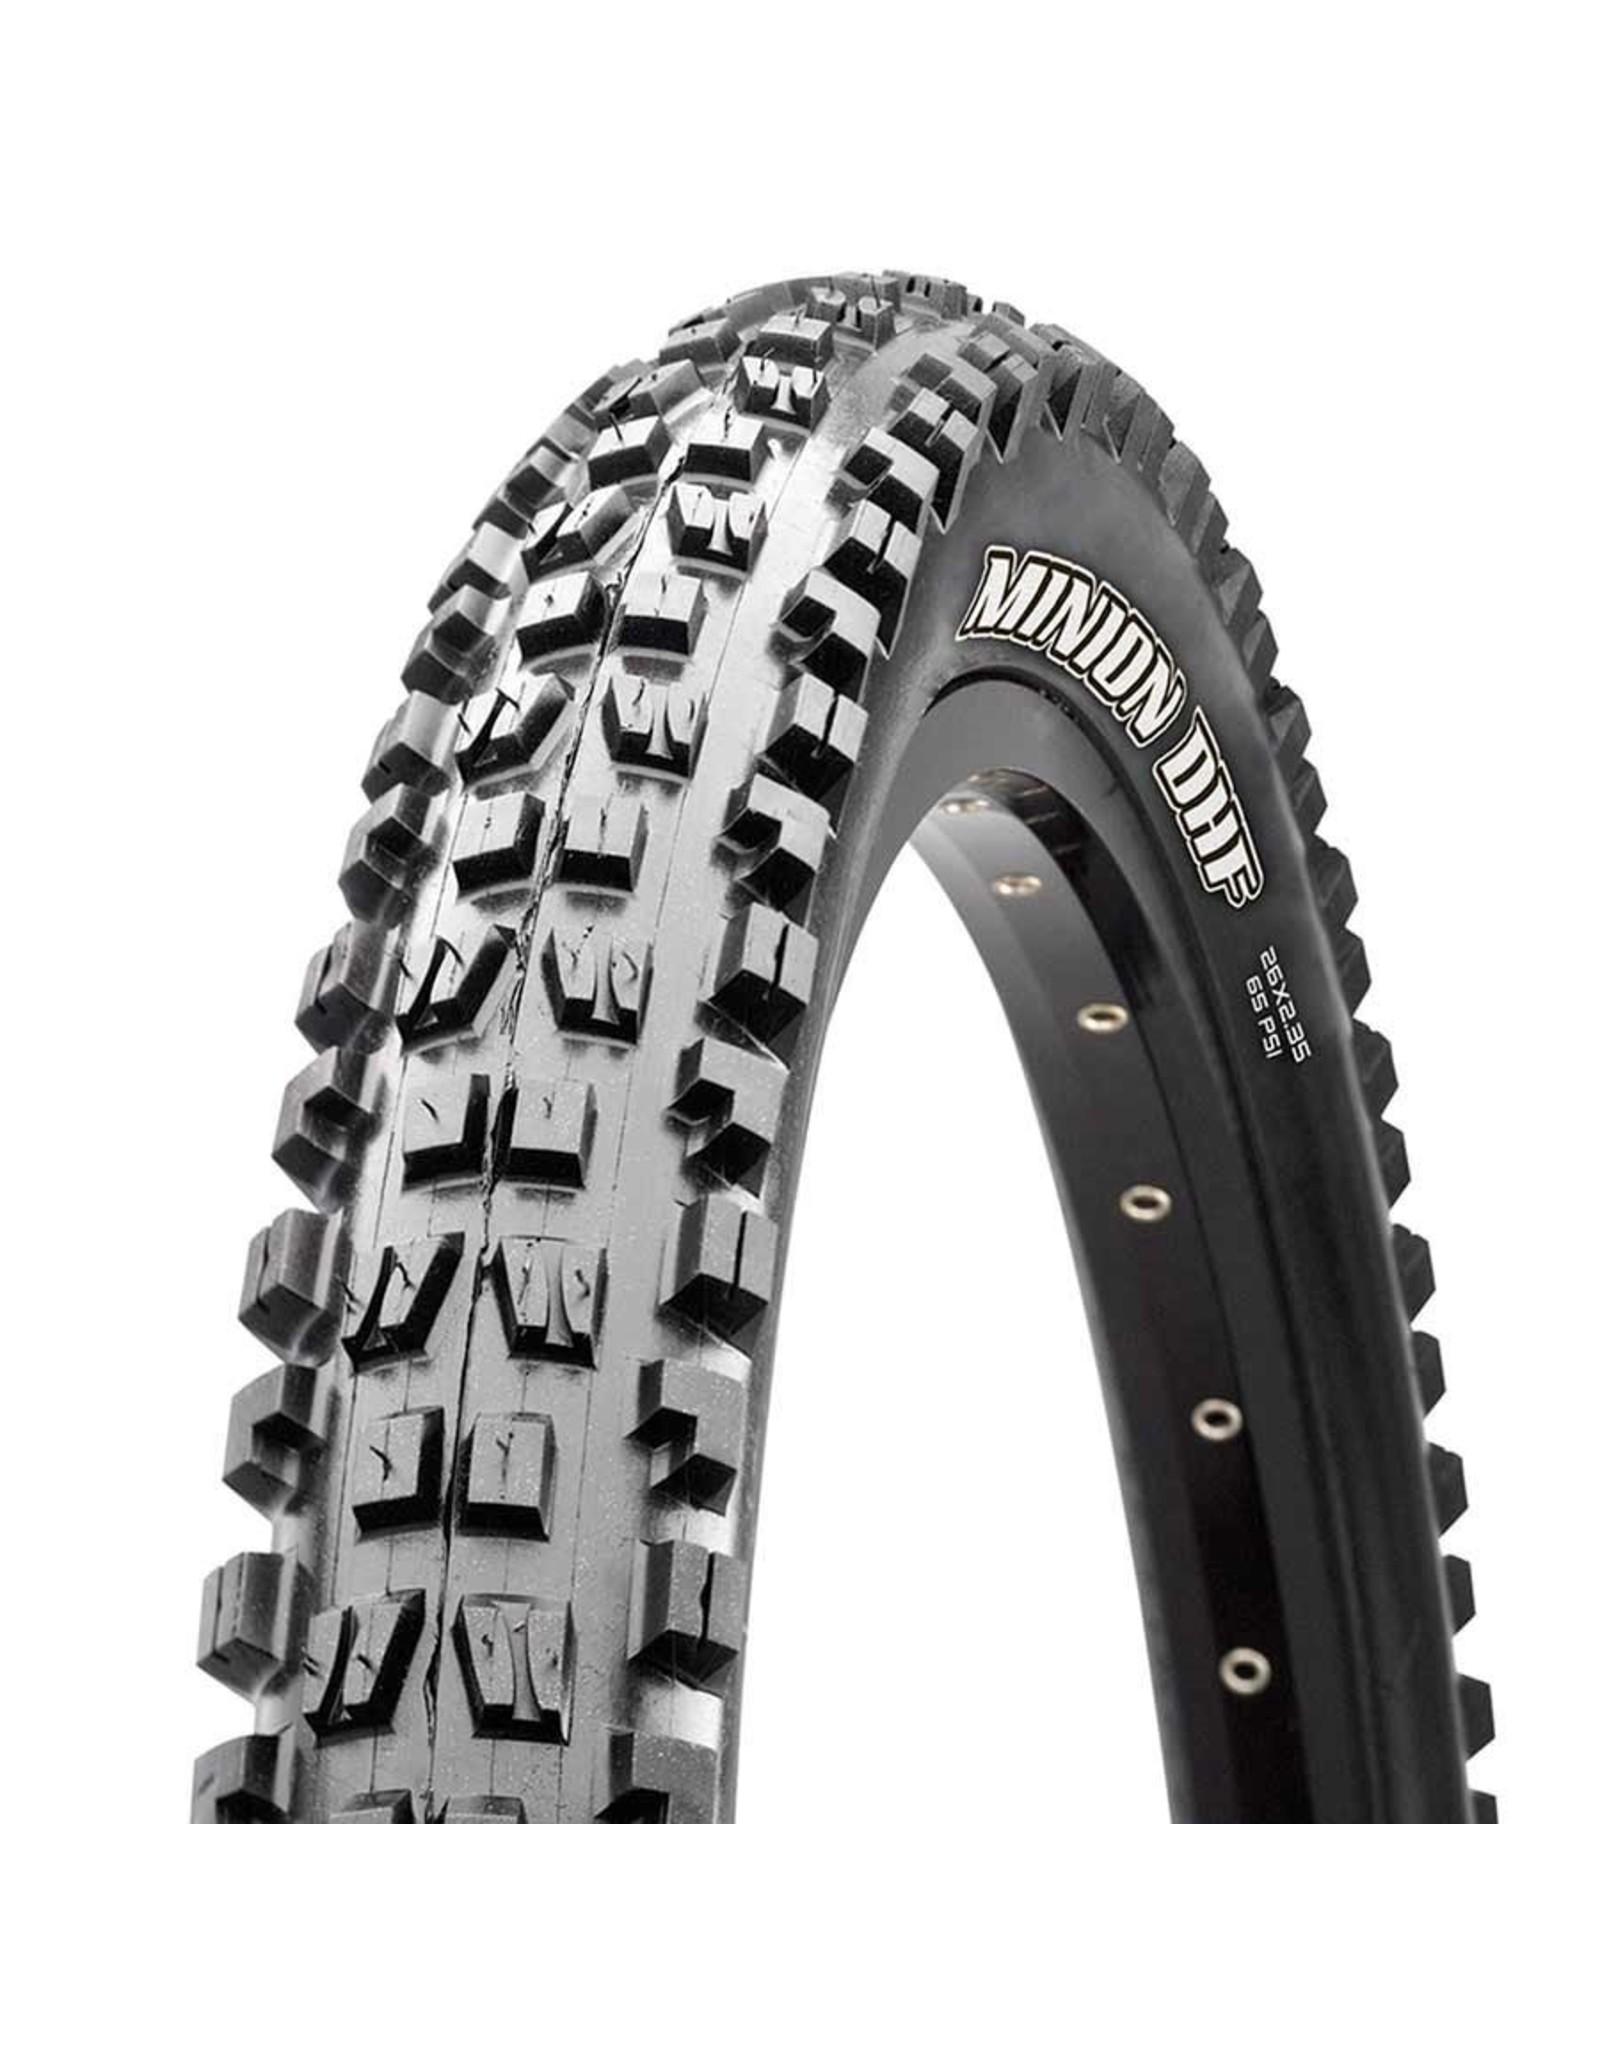 Maxxis 29x2.50 Minion DHF, Fold, TR, 3C Maxx Grip, Double Down, Wide Trail, 120x2TPI, Black